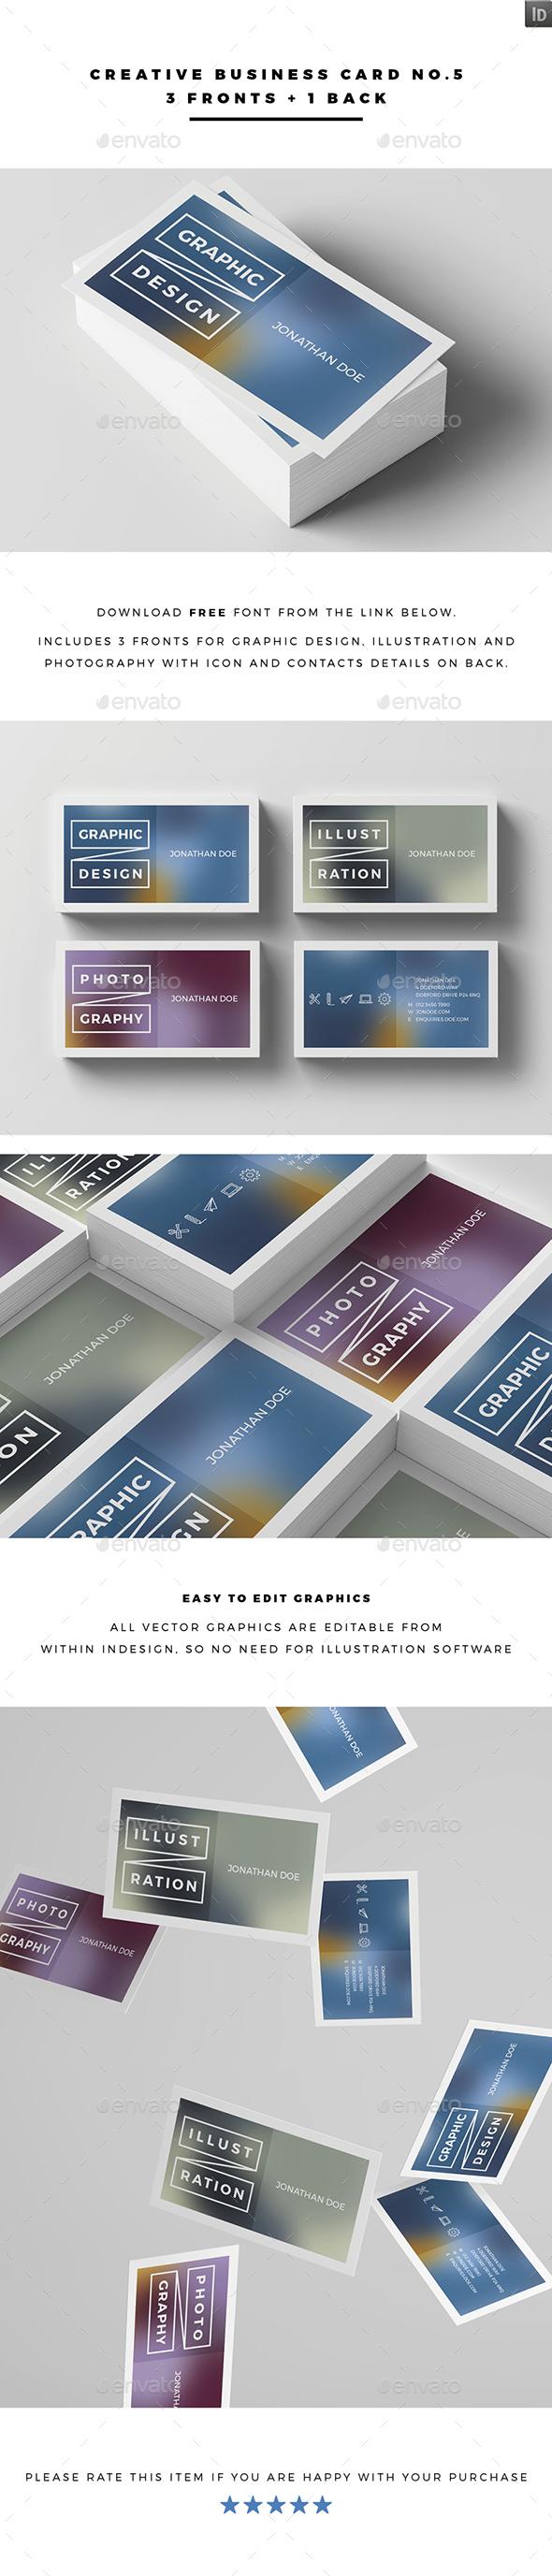 Creative Business Card No.5 - Creative Business Cards